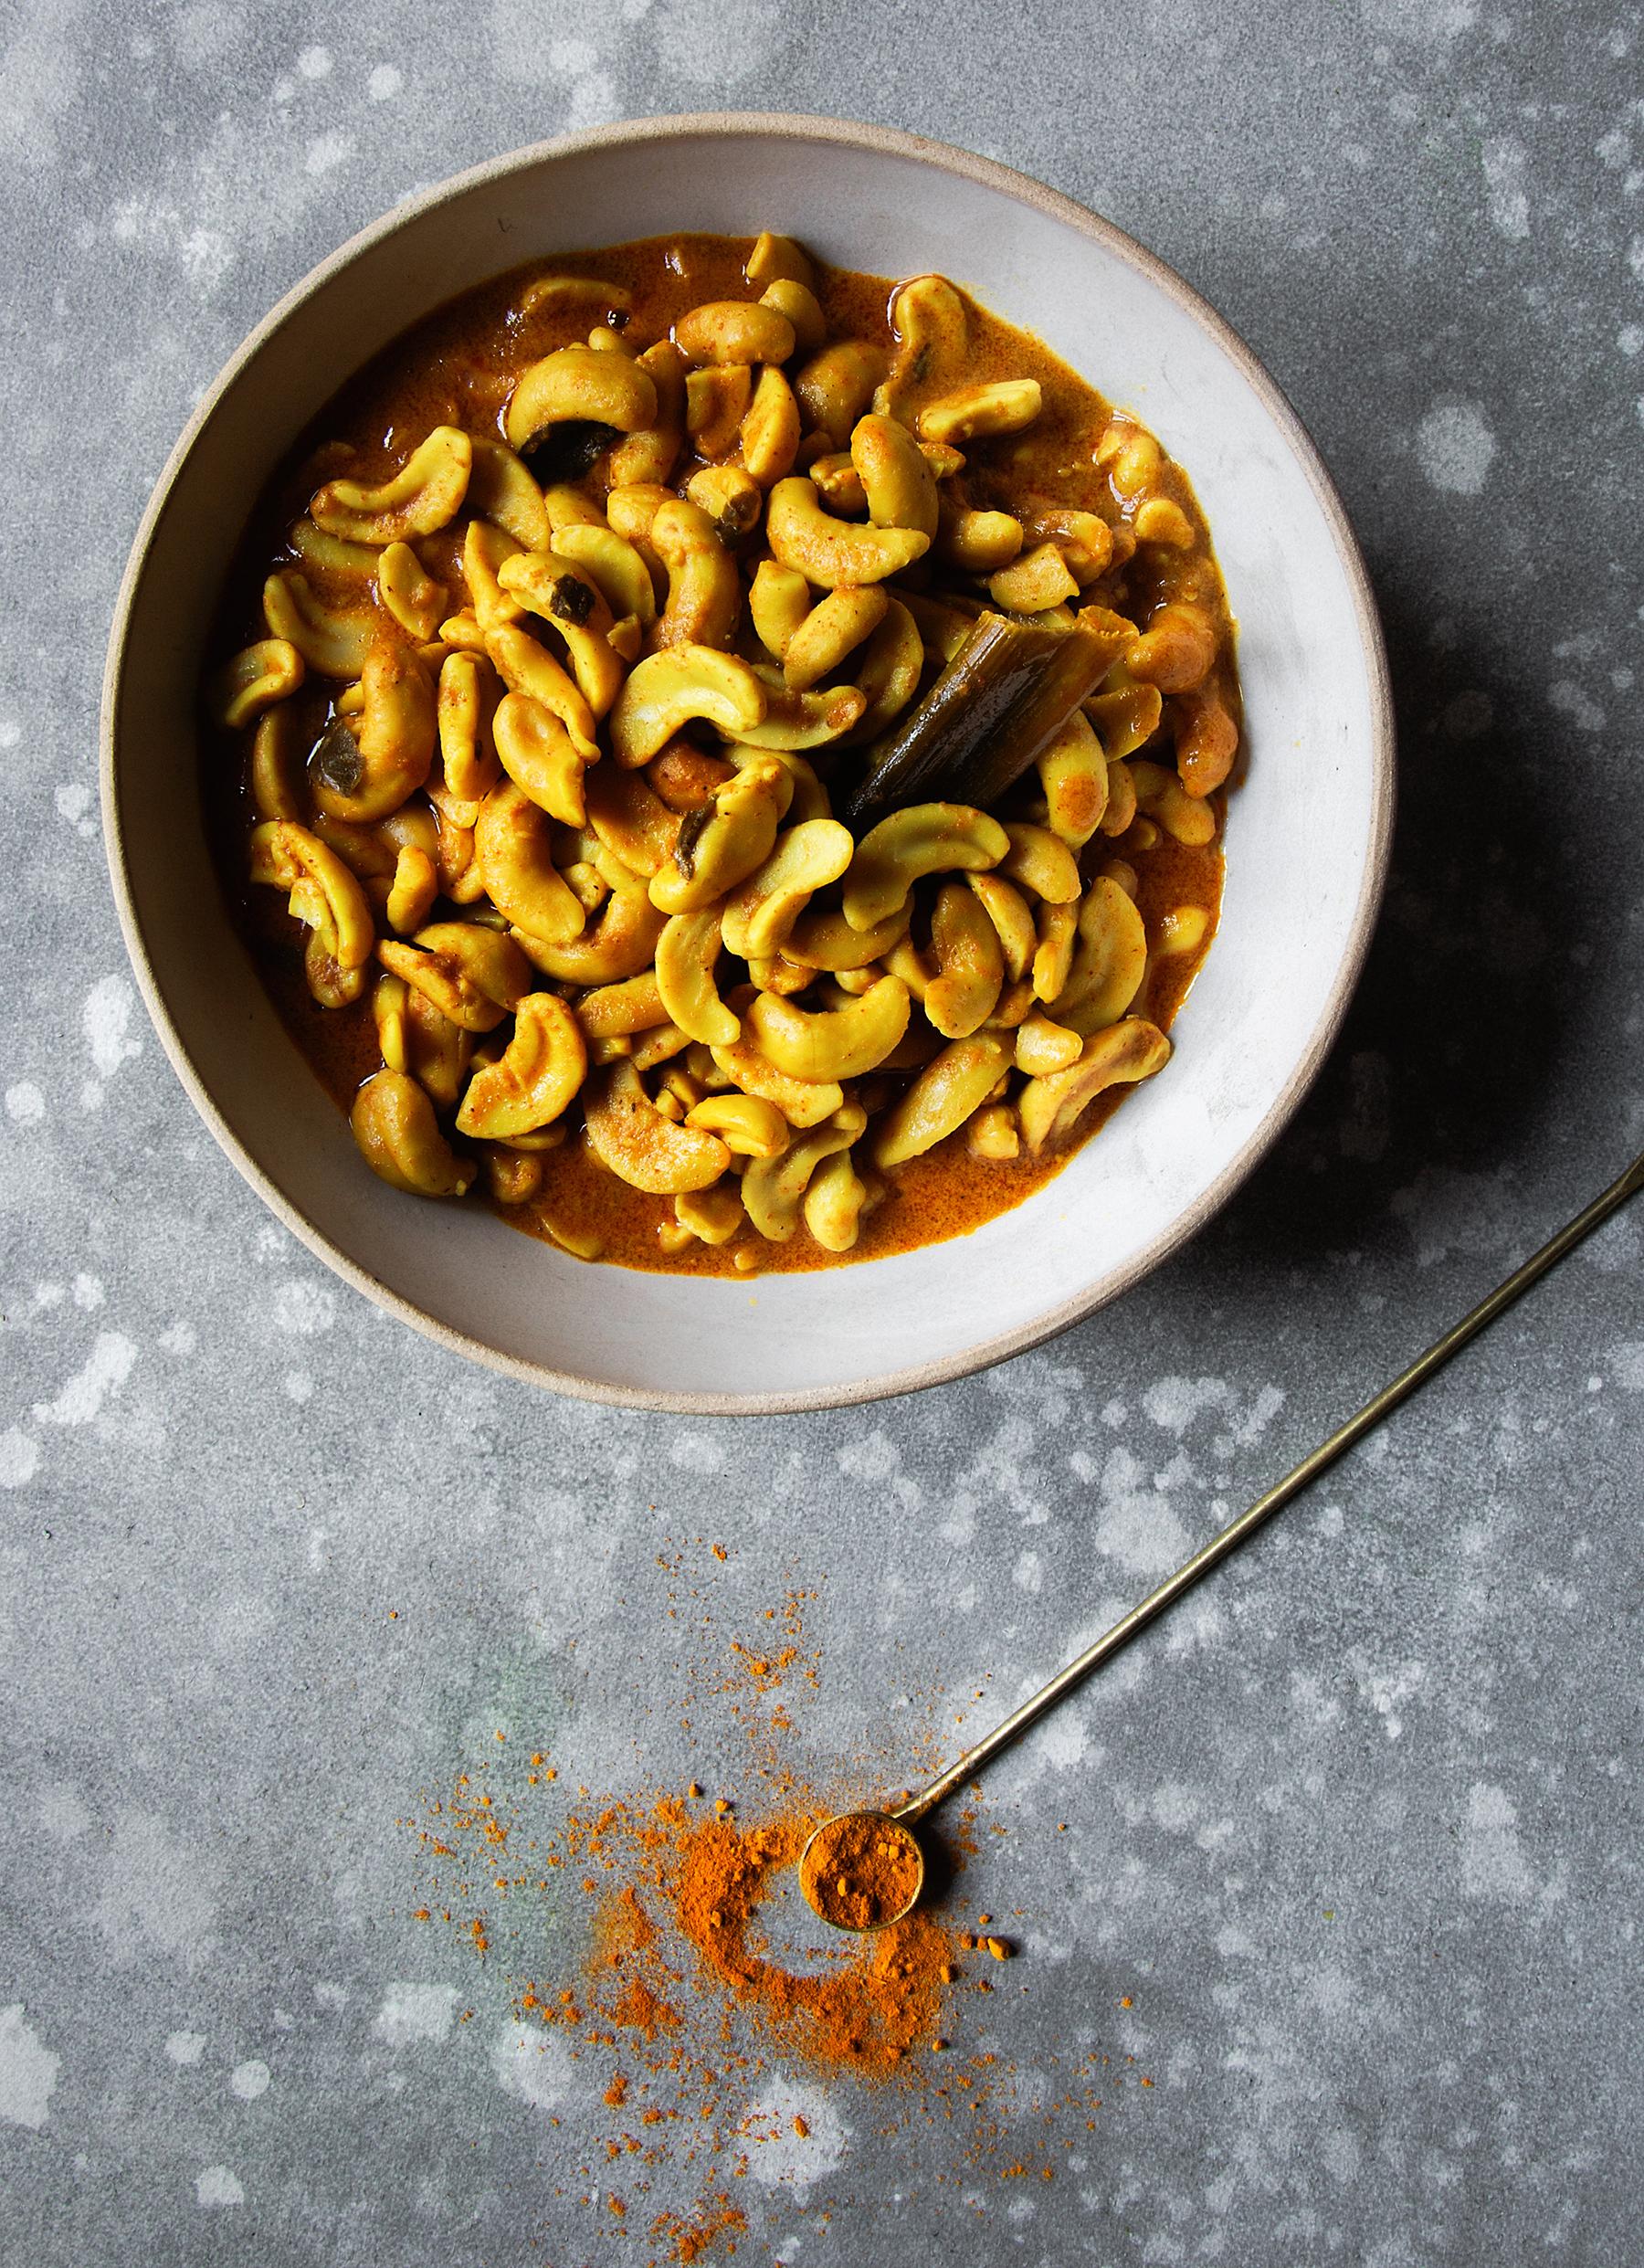 Cashewnut curry